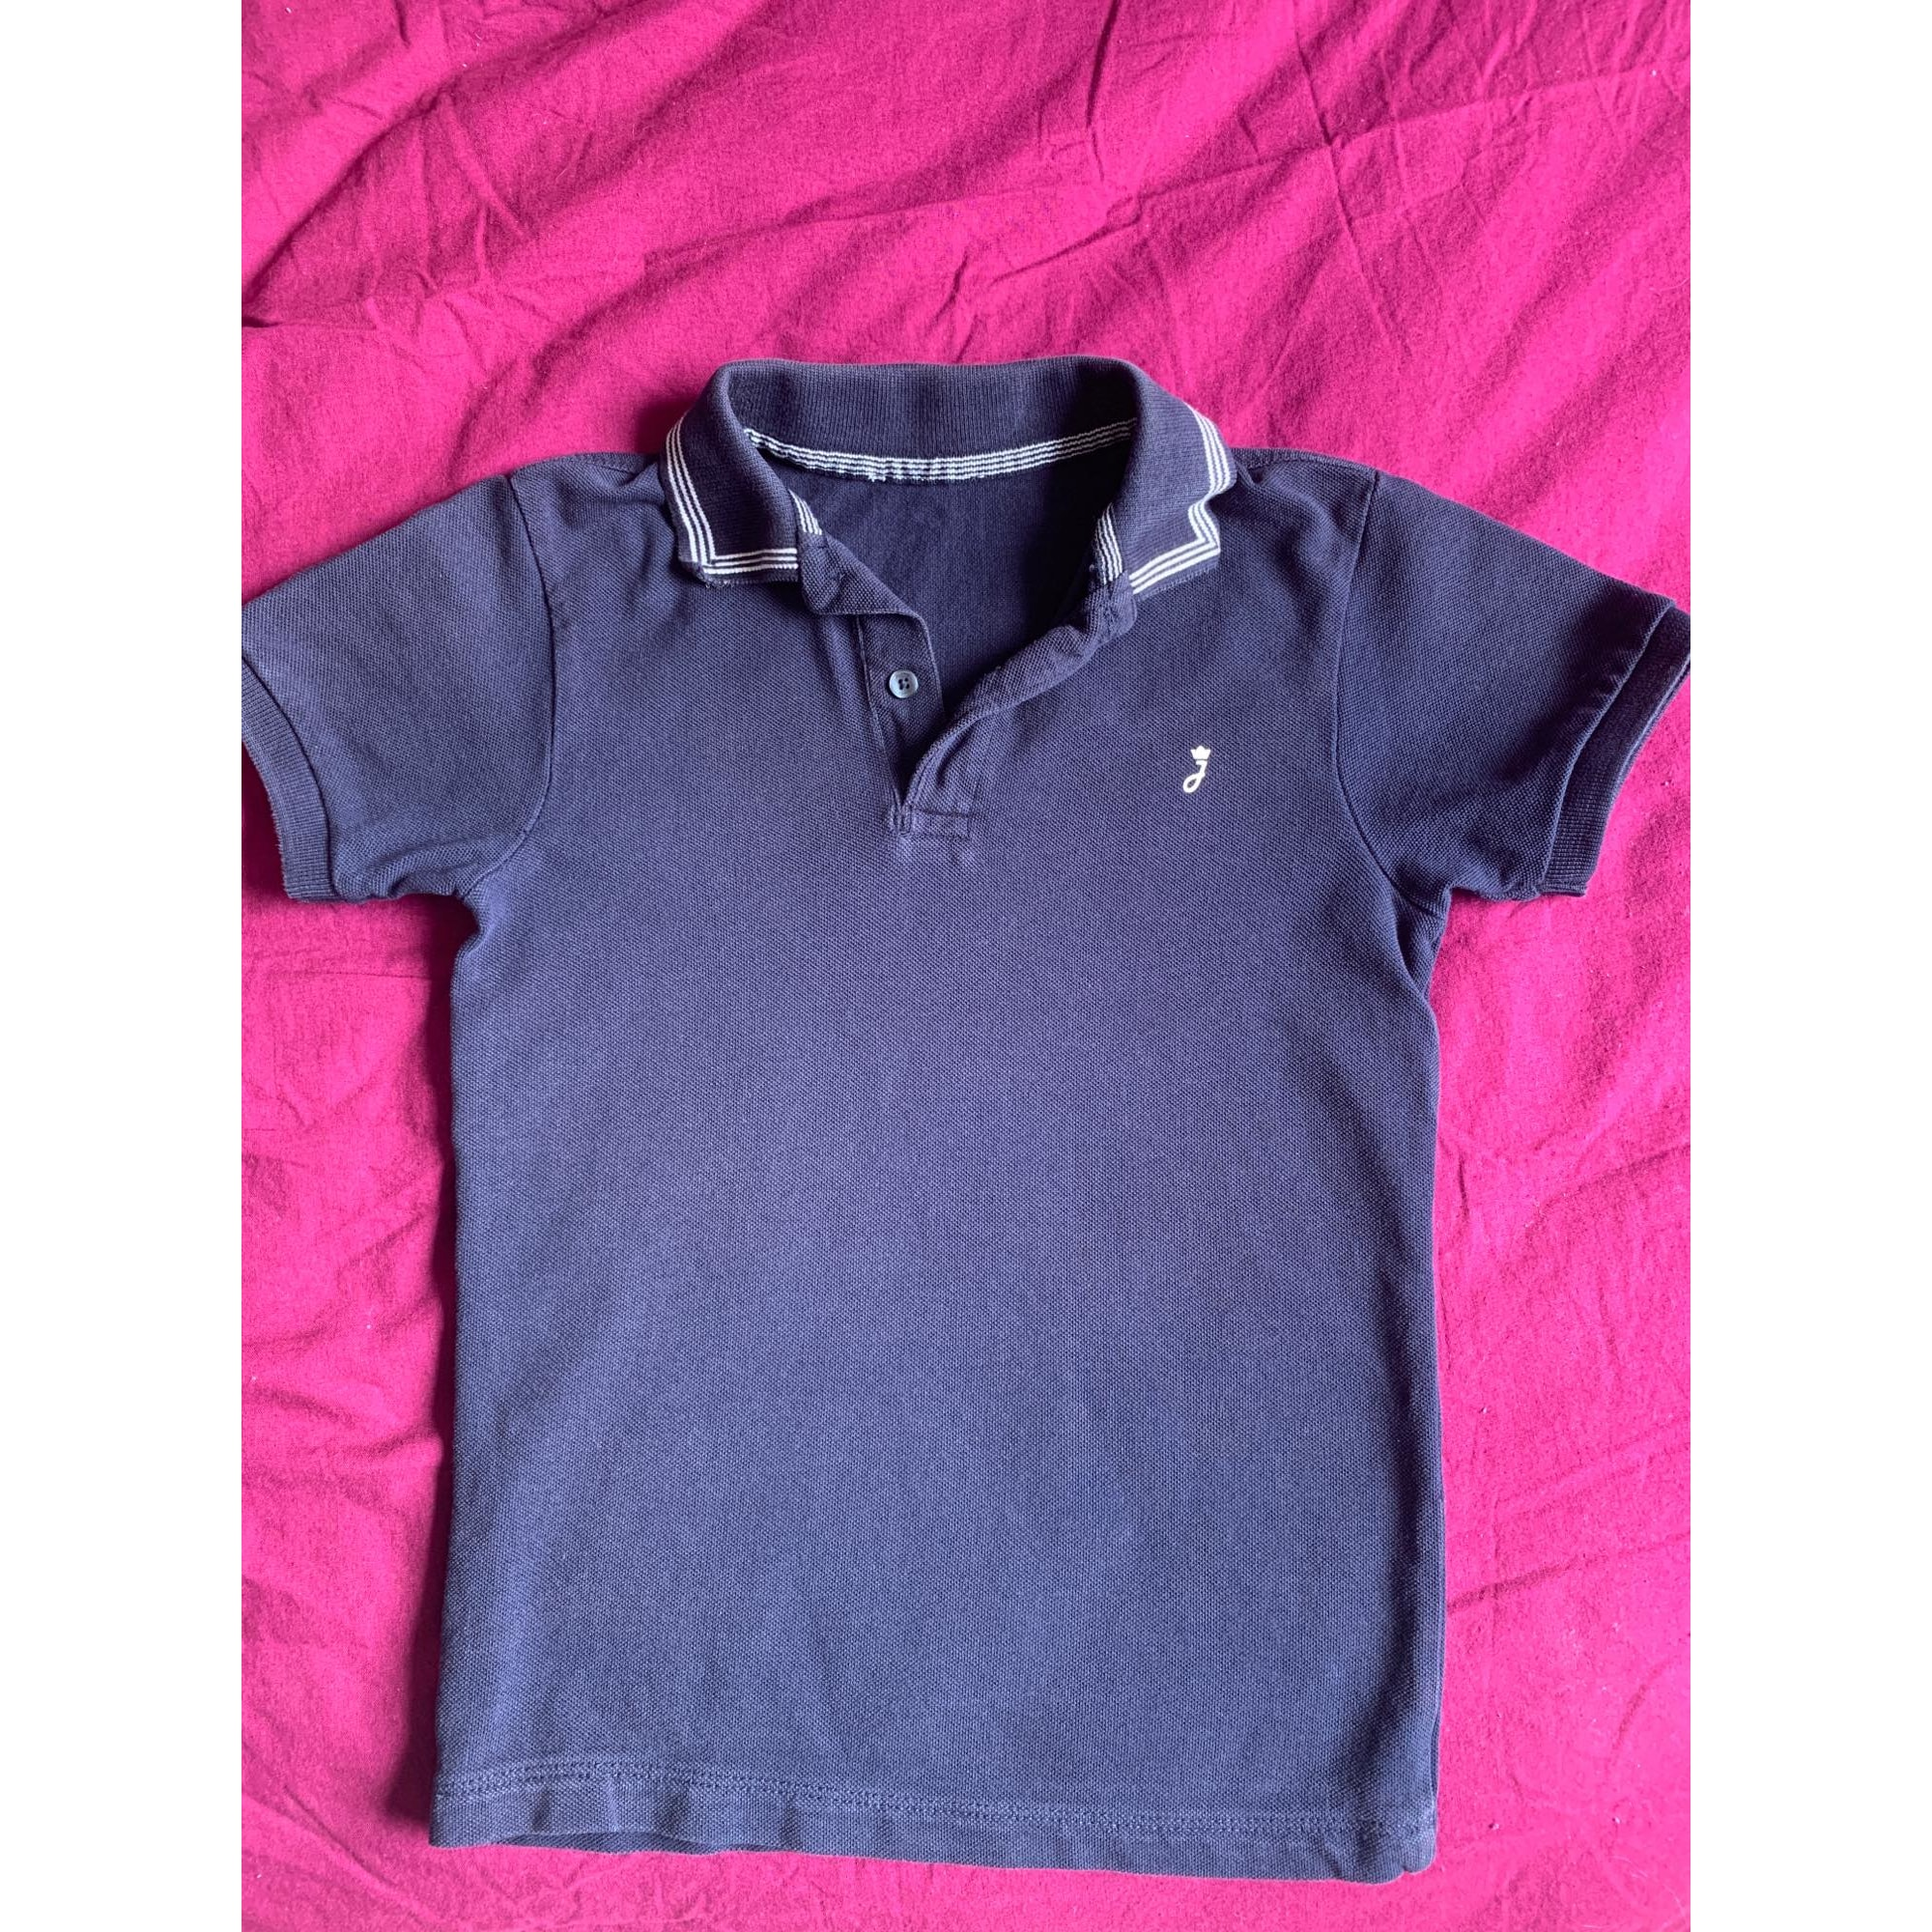 Polo JACADI Blue, navy, turquoise